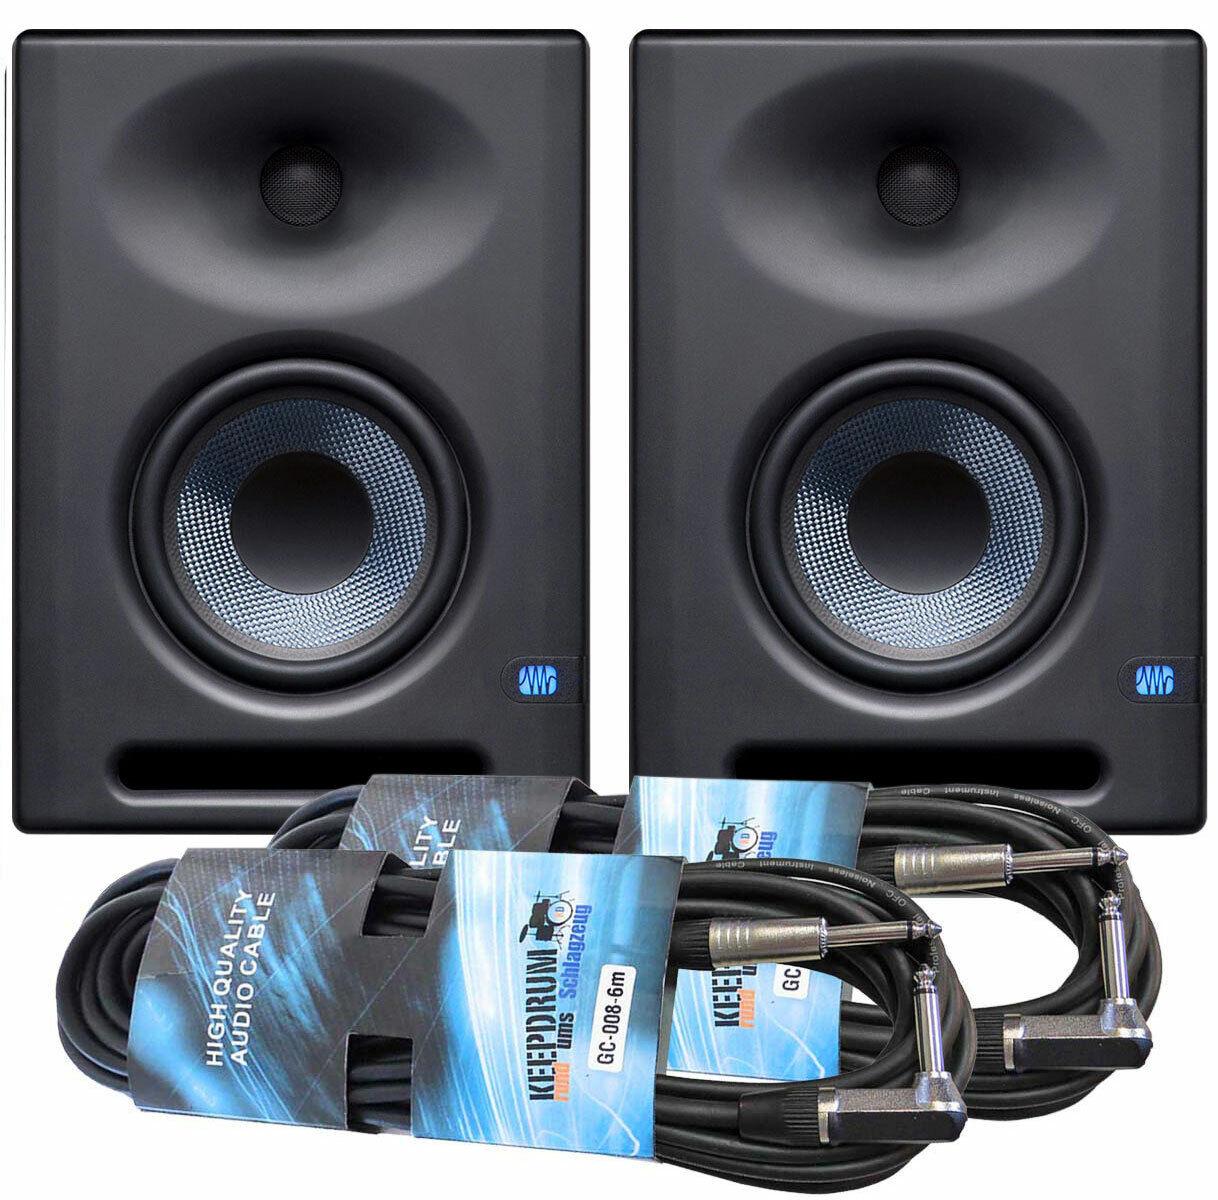 Presonus Eris E5 XT Studio Moniteur 1 Paire 2x Keepdrum Kabel Jack 6m